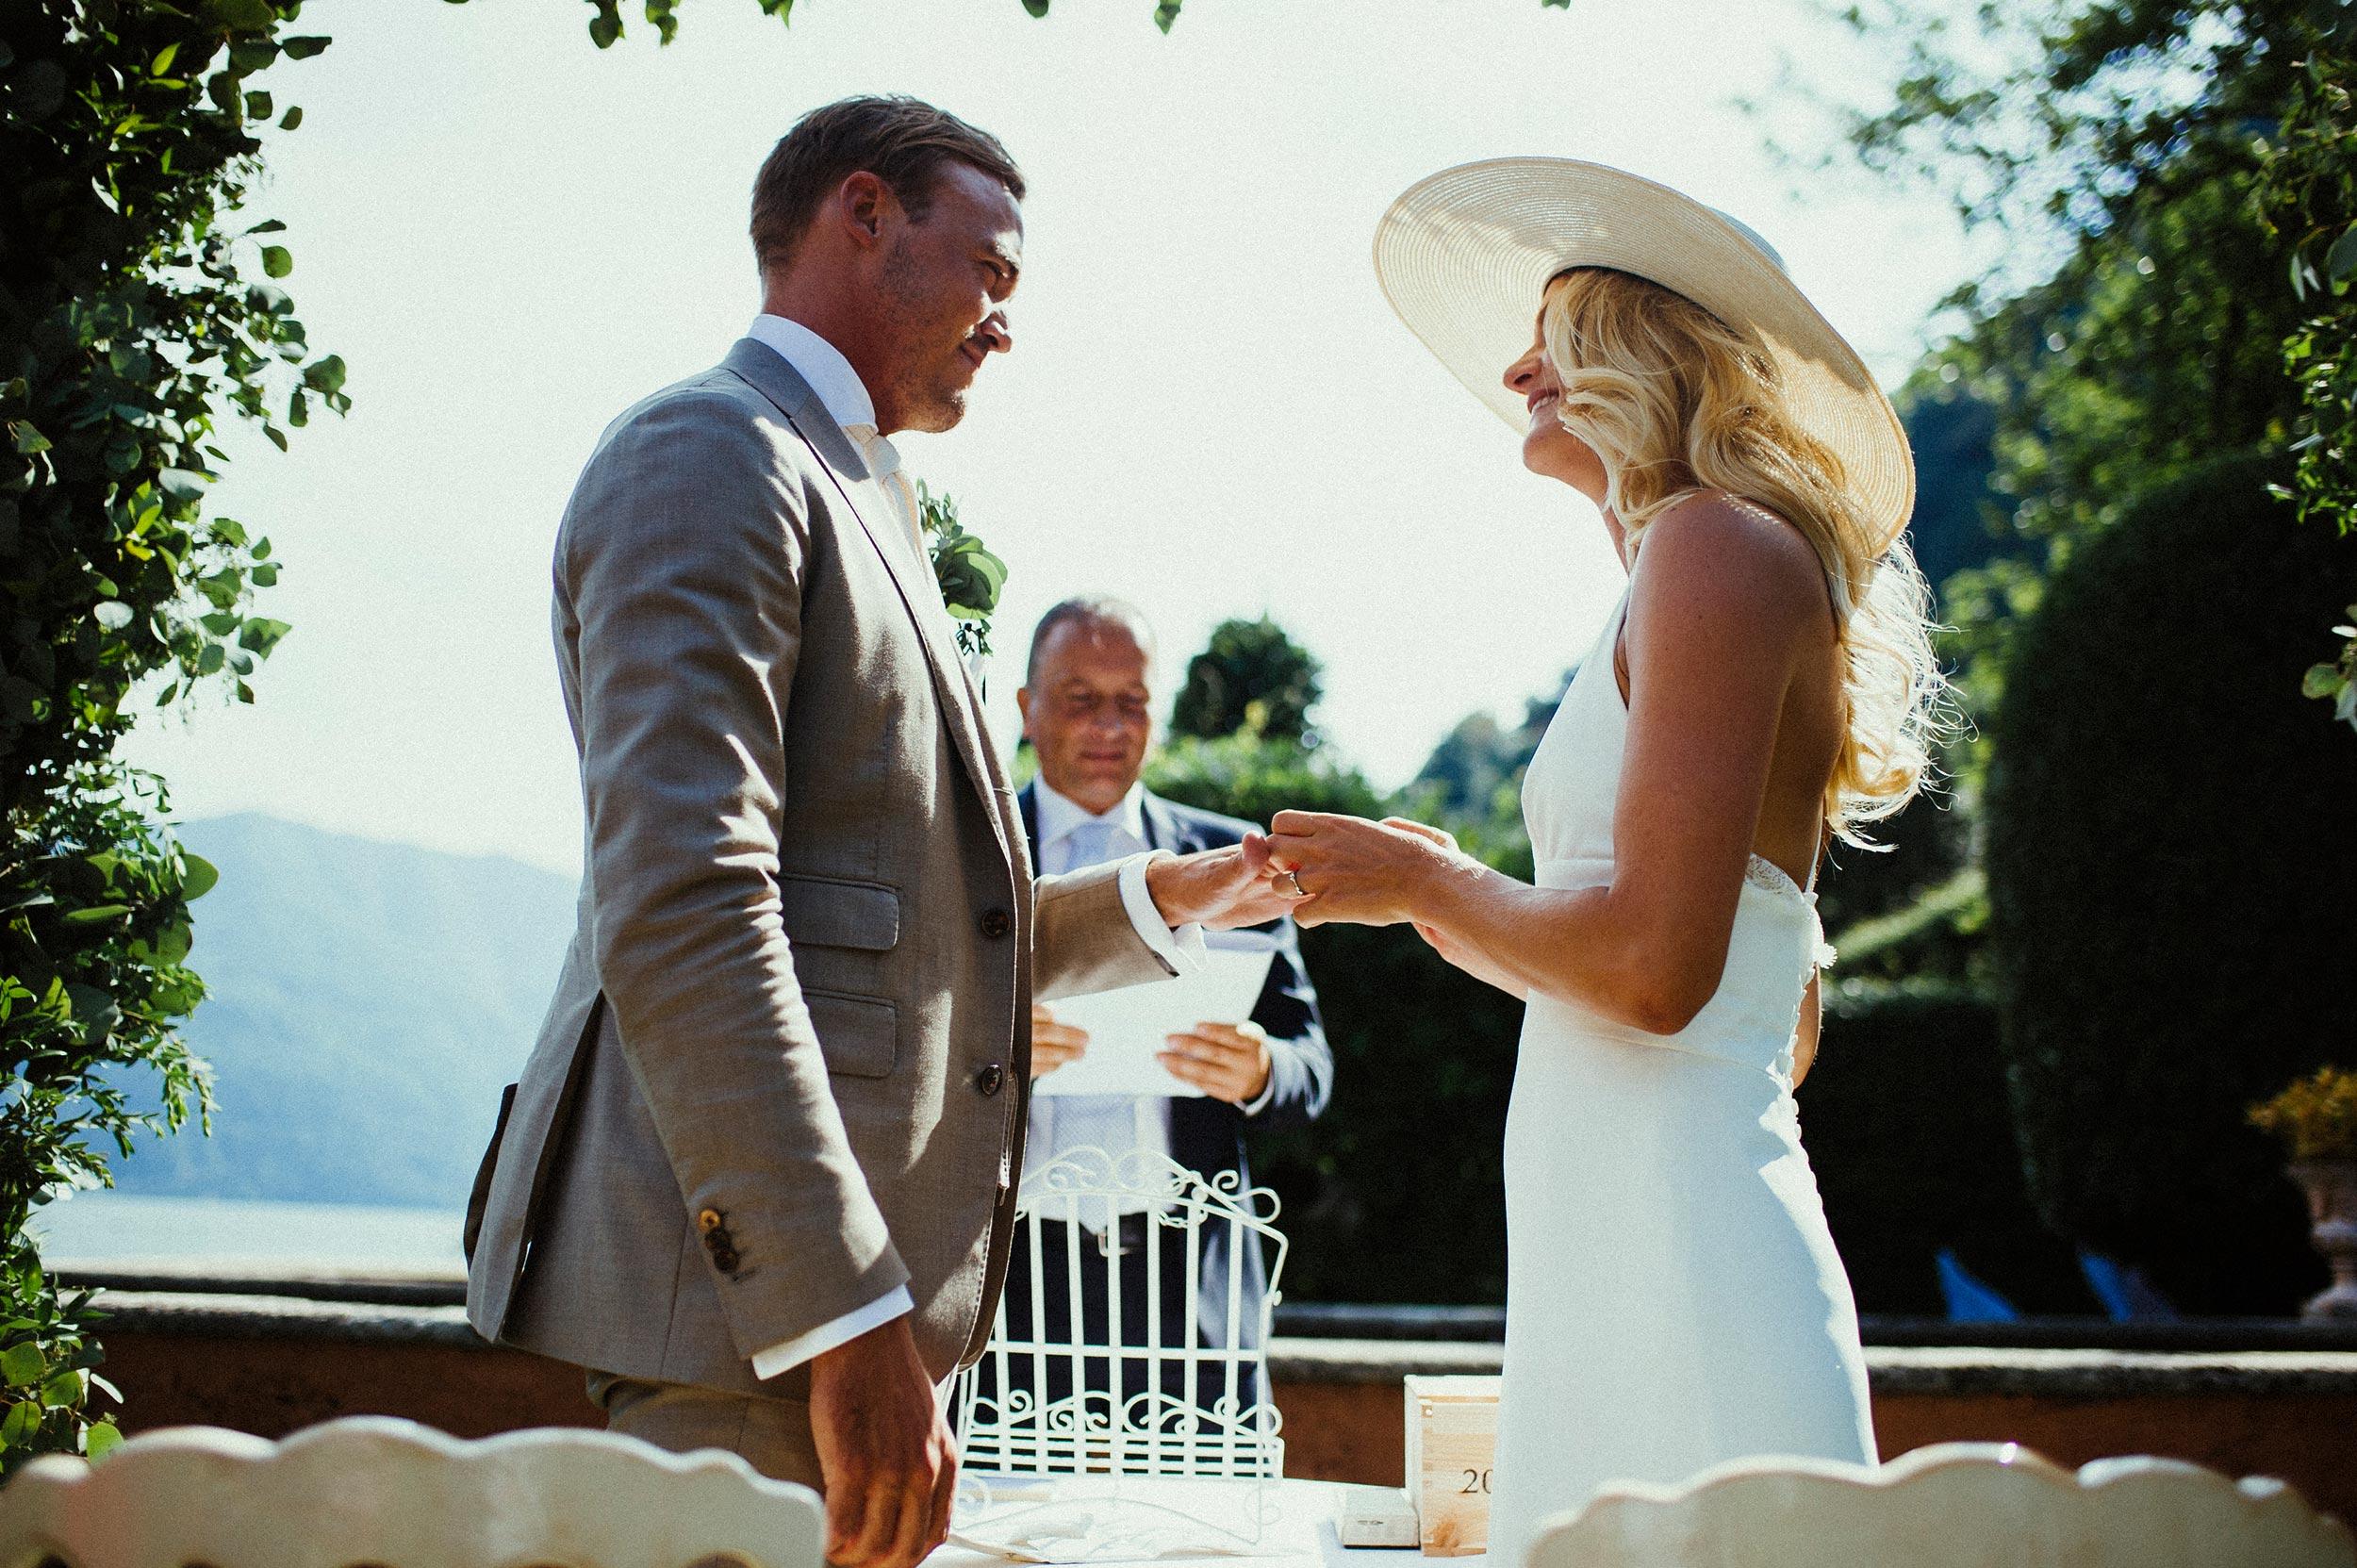 2018-Villa-Regina-Teodolinda-Lake-Como-Wedding-Photographer-Italy-Alessandro-Avenali-186.jpg